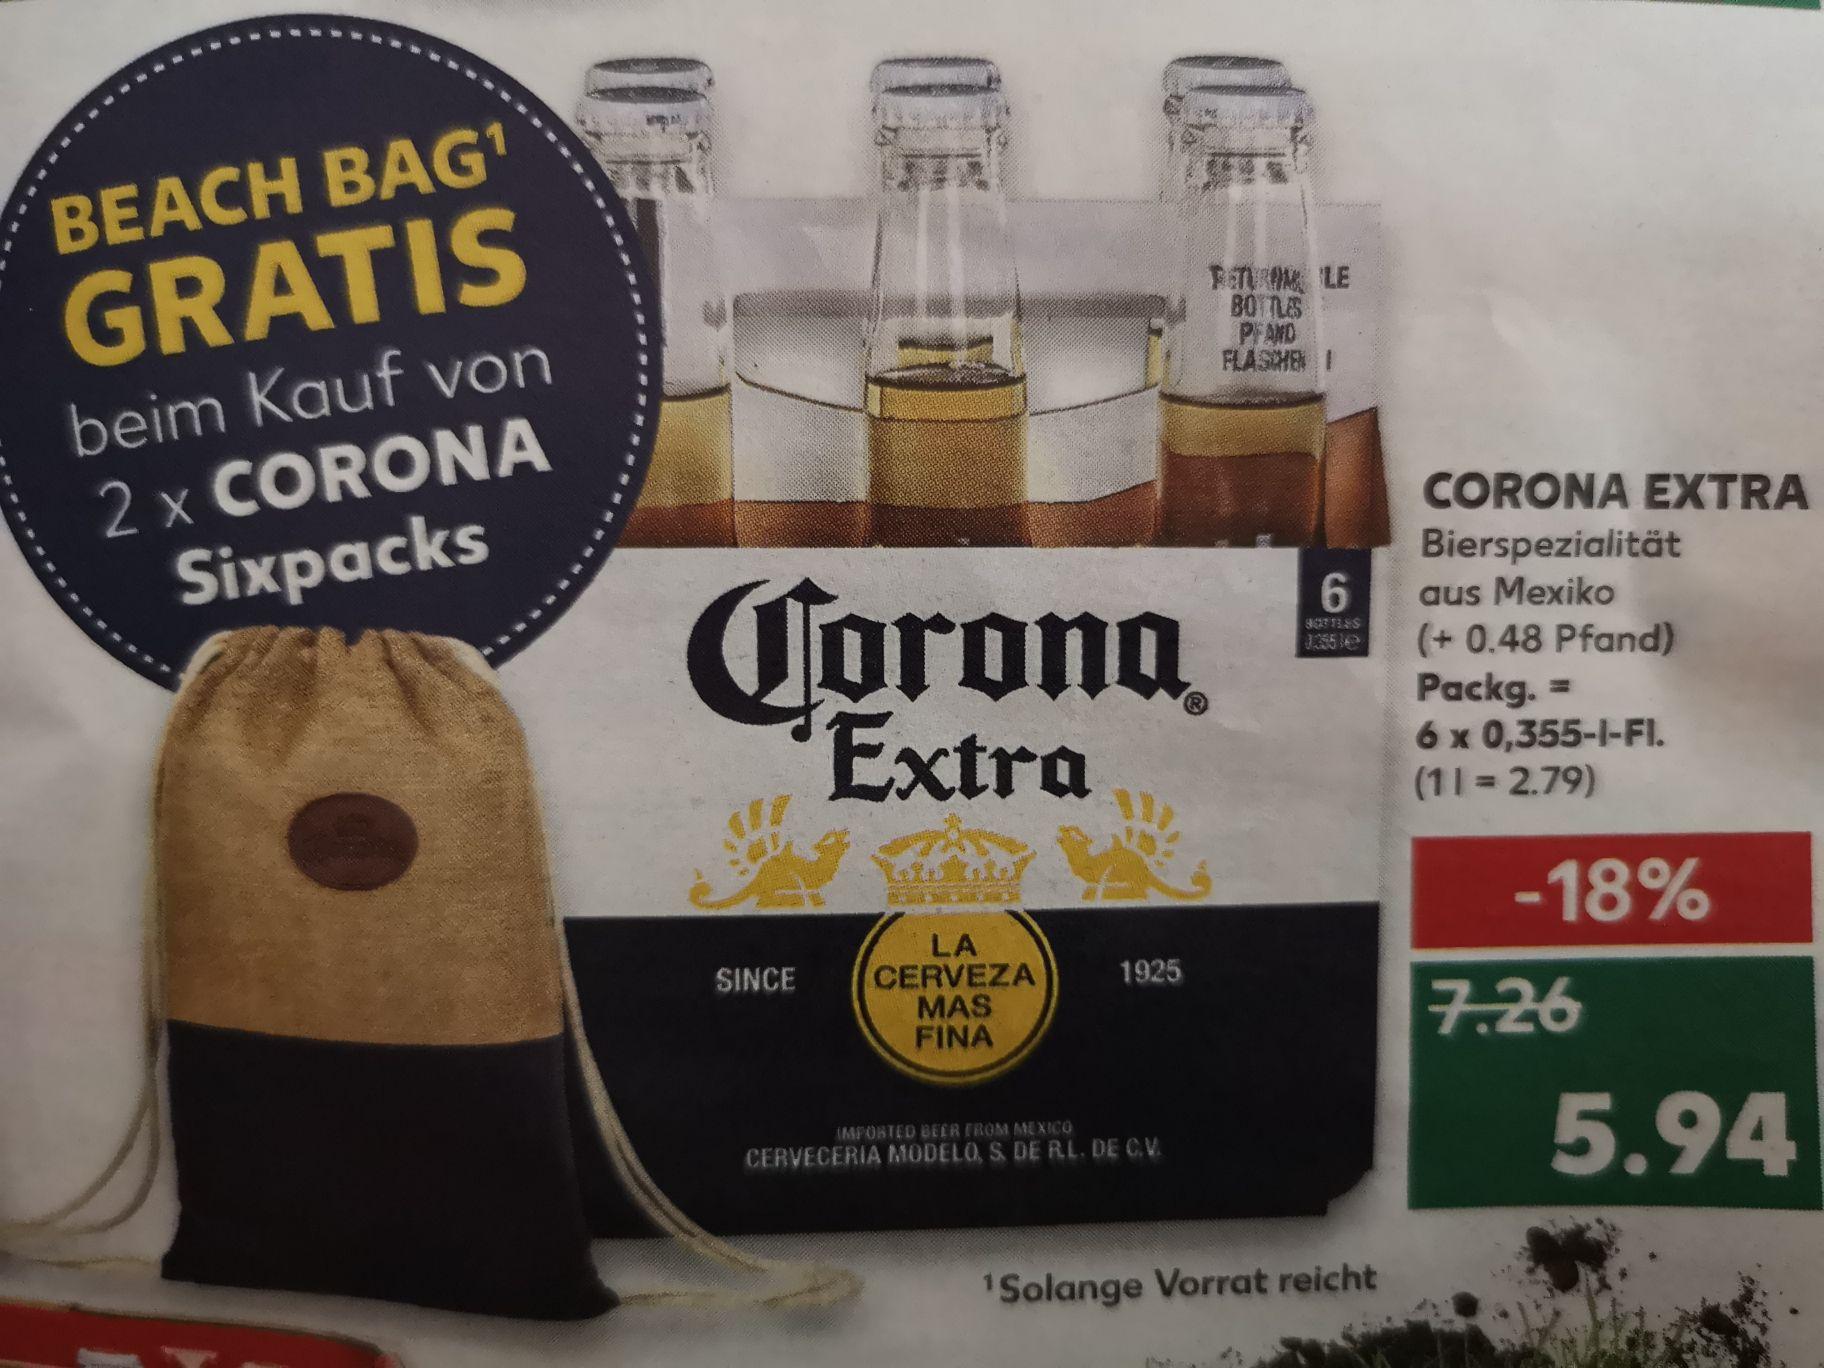 [Kaufland] Corona Extra Beer Sixpack (6x0,355l) für 5,94€ zzgl. 0,48€ Pfand - gratis Beach Bag mgl.